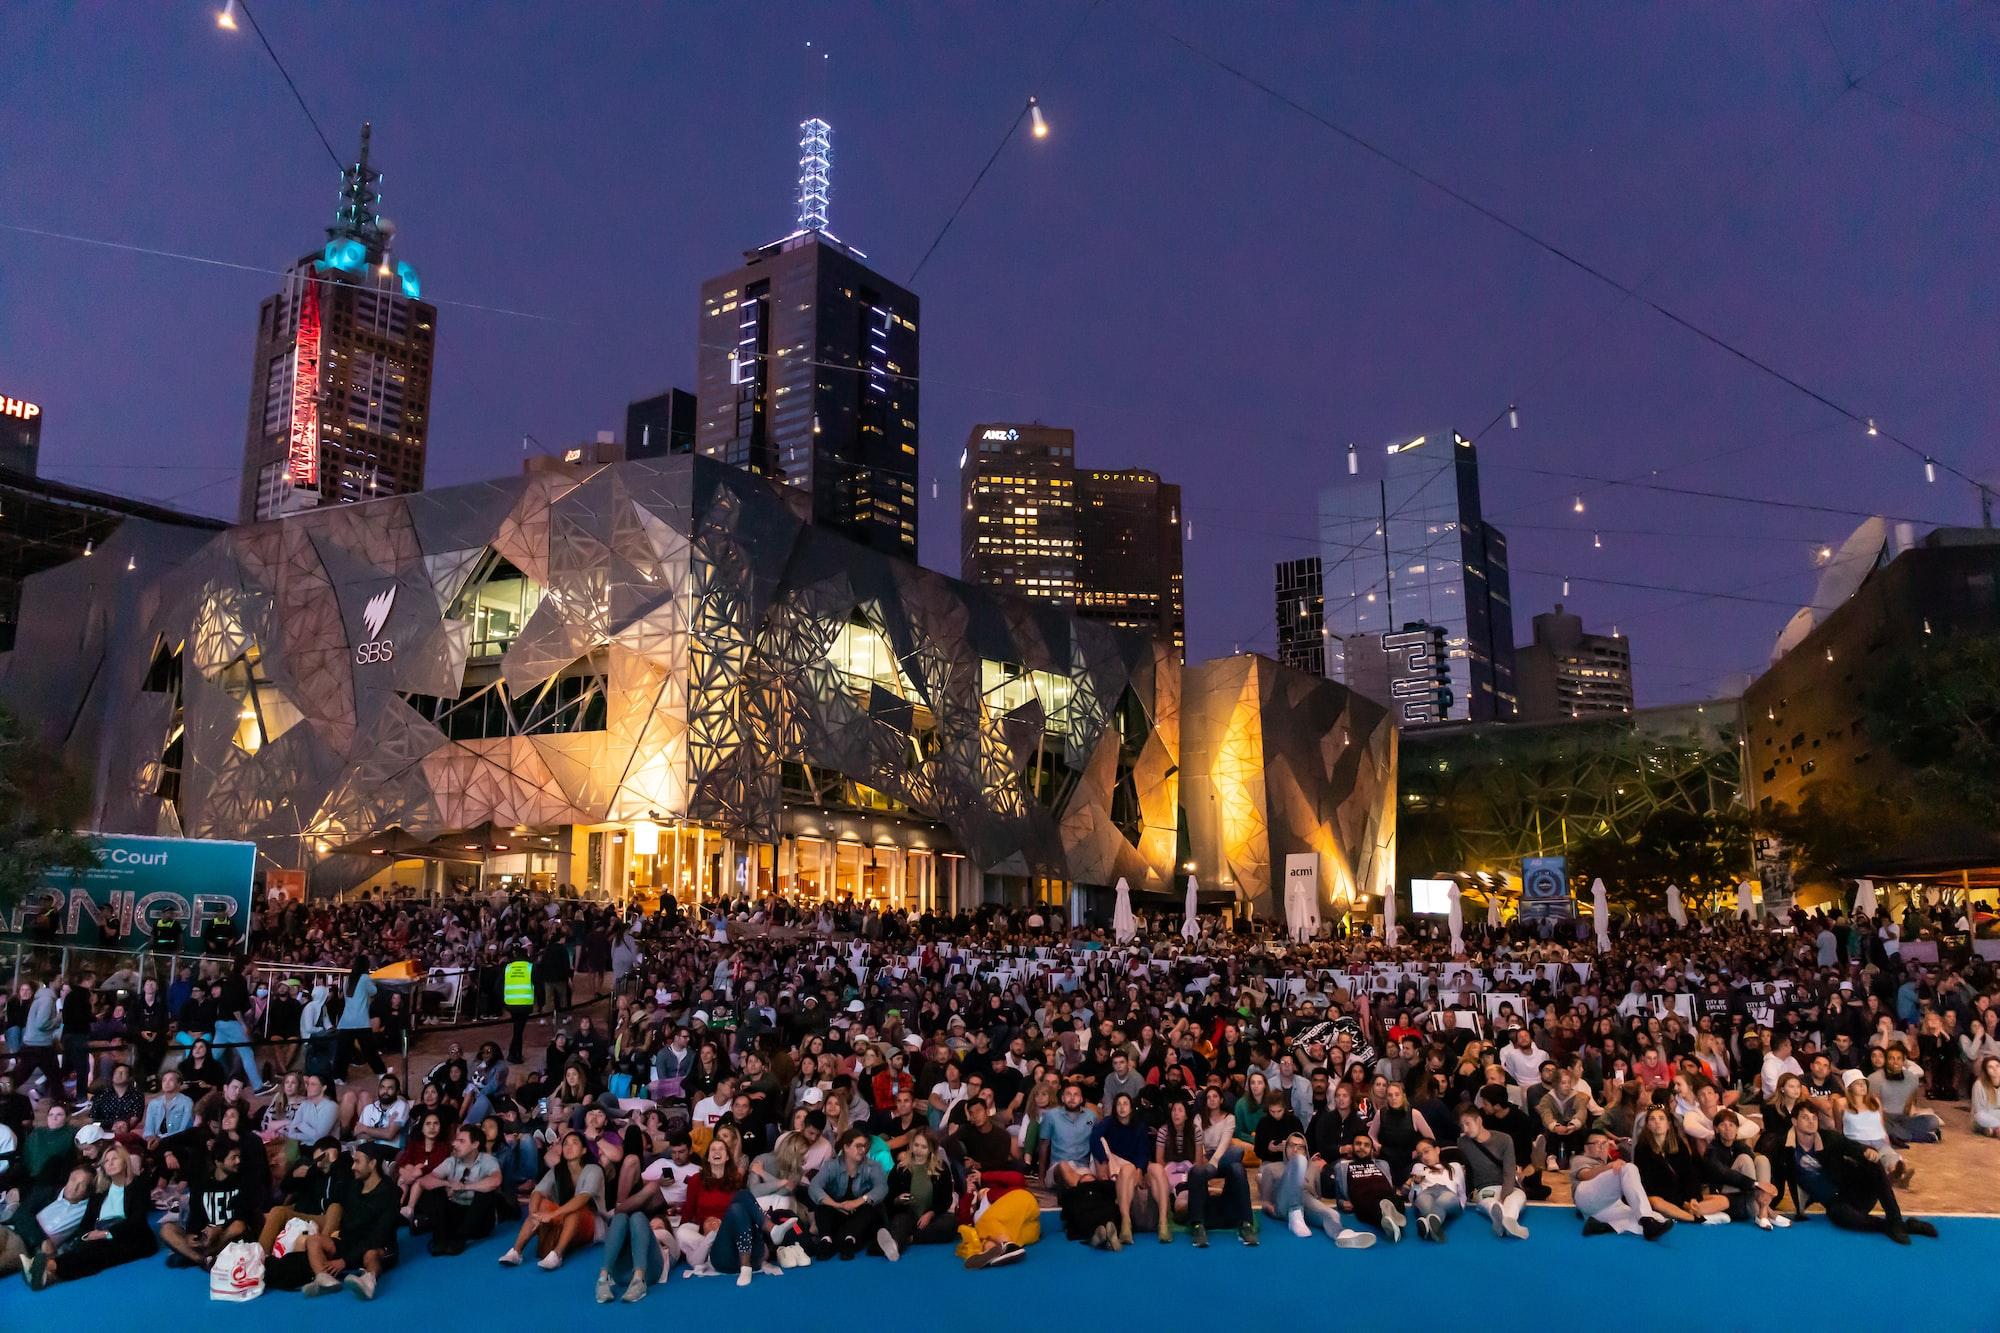 Australian Open Men's Final Night, Federation Square